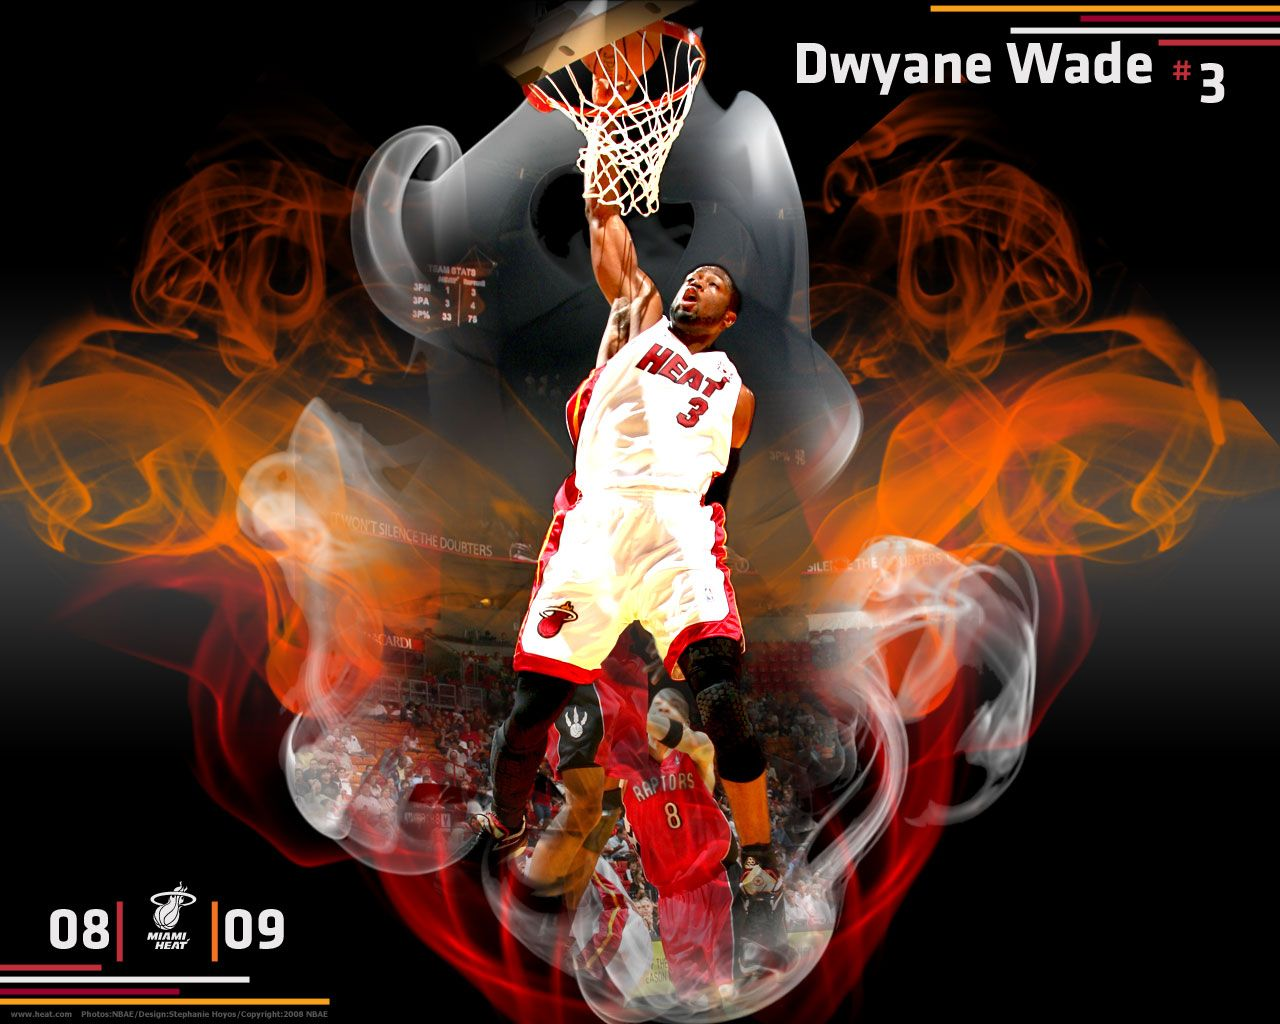 Dwyane Wade Miami Heat Wallpapers Hd Basketball Wallpaper Basketball Wallpapers Hd Dwyane Wade